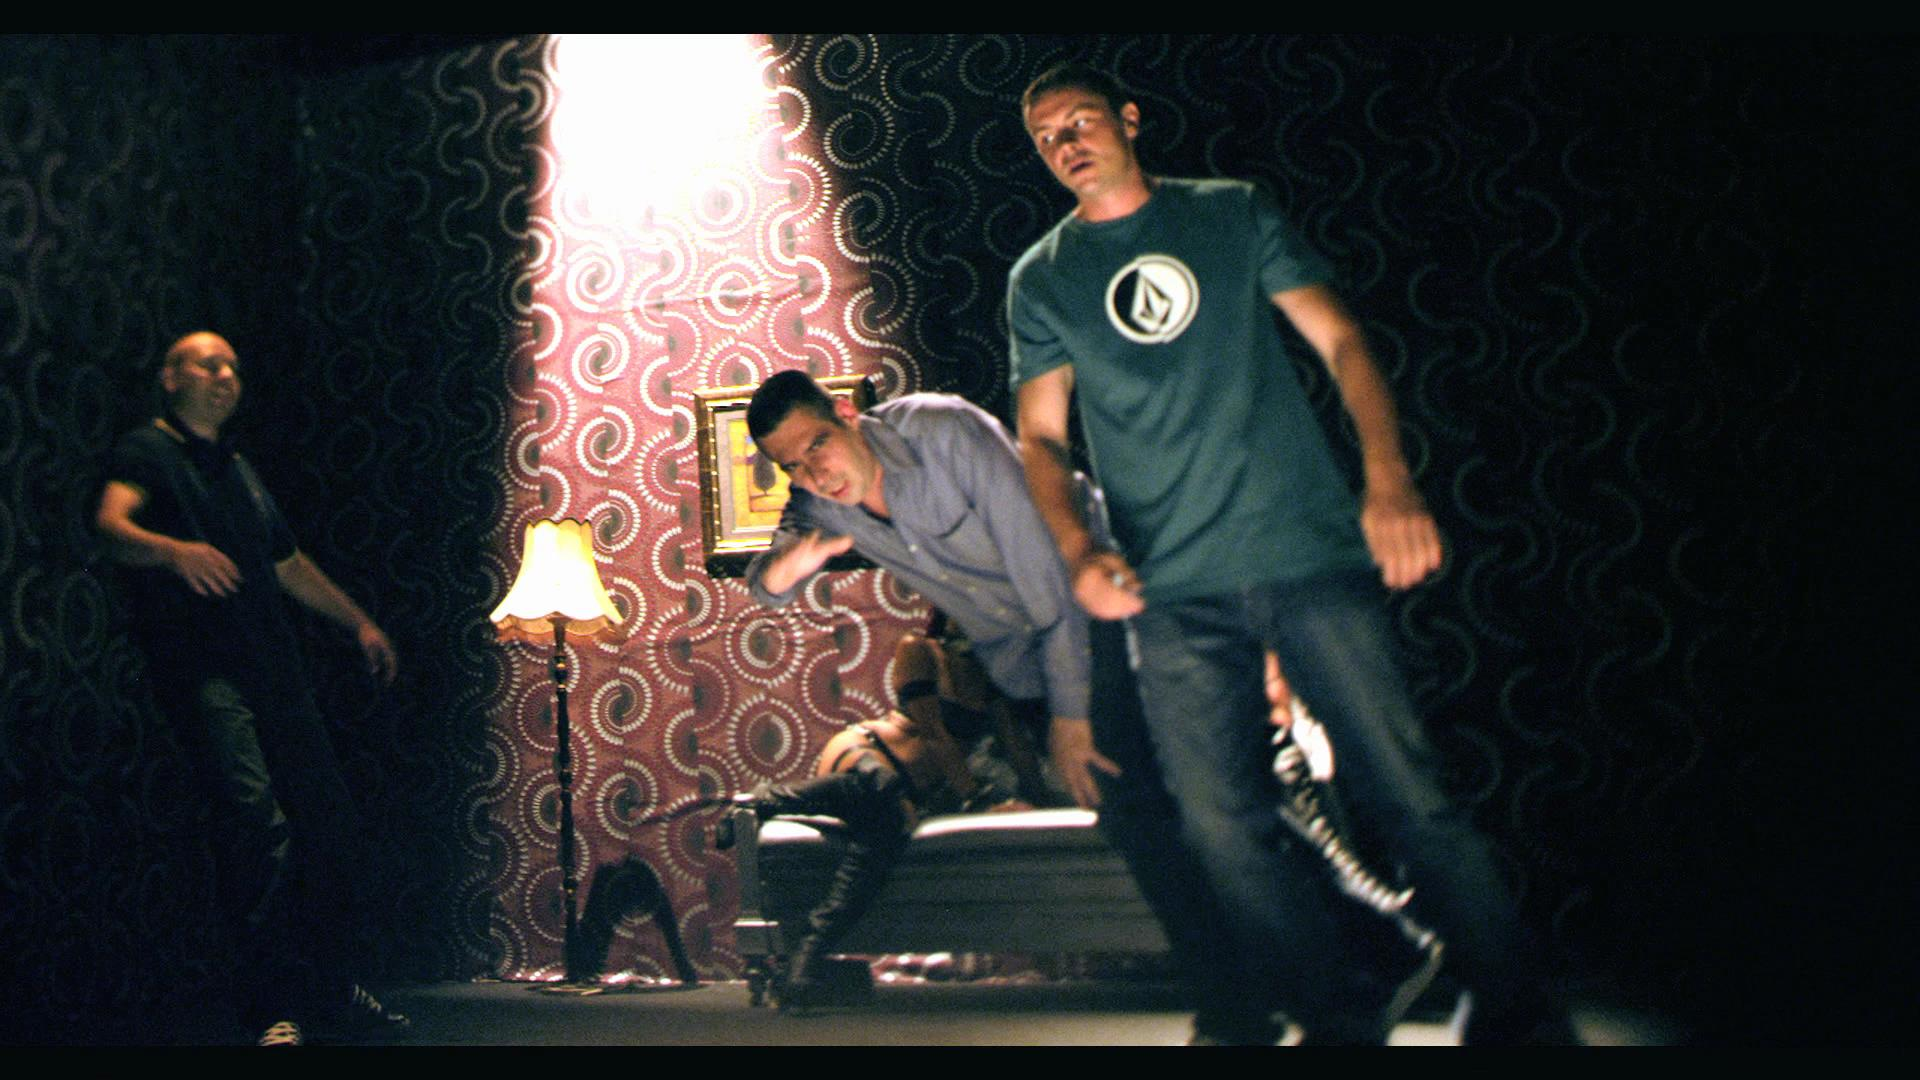 Ъпсурт представиха ново видео в стил Дейвид Линч